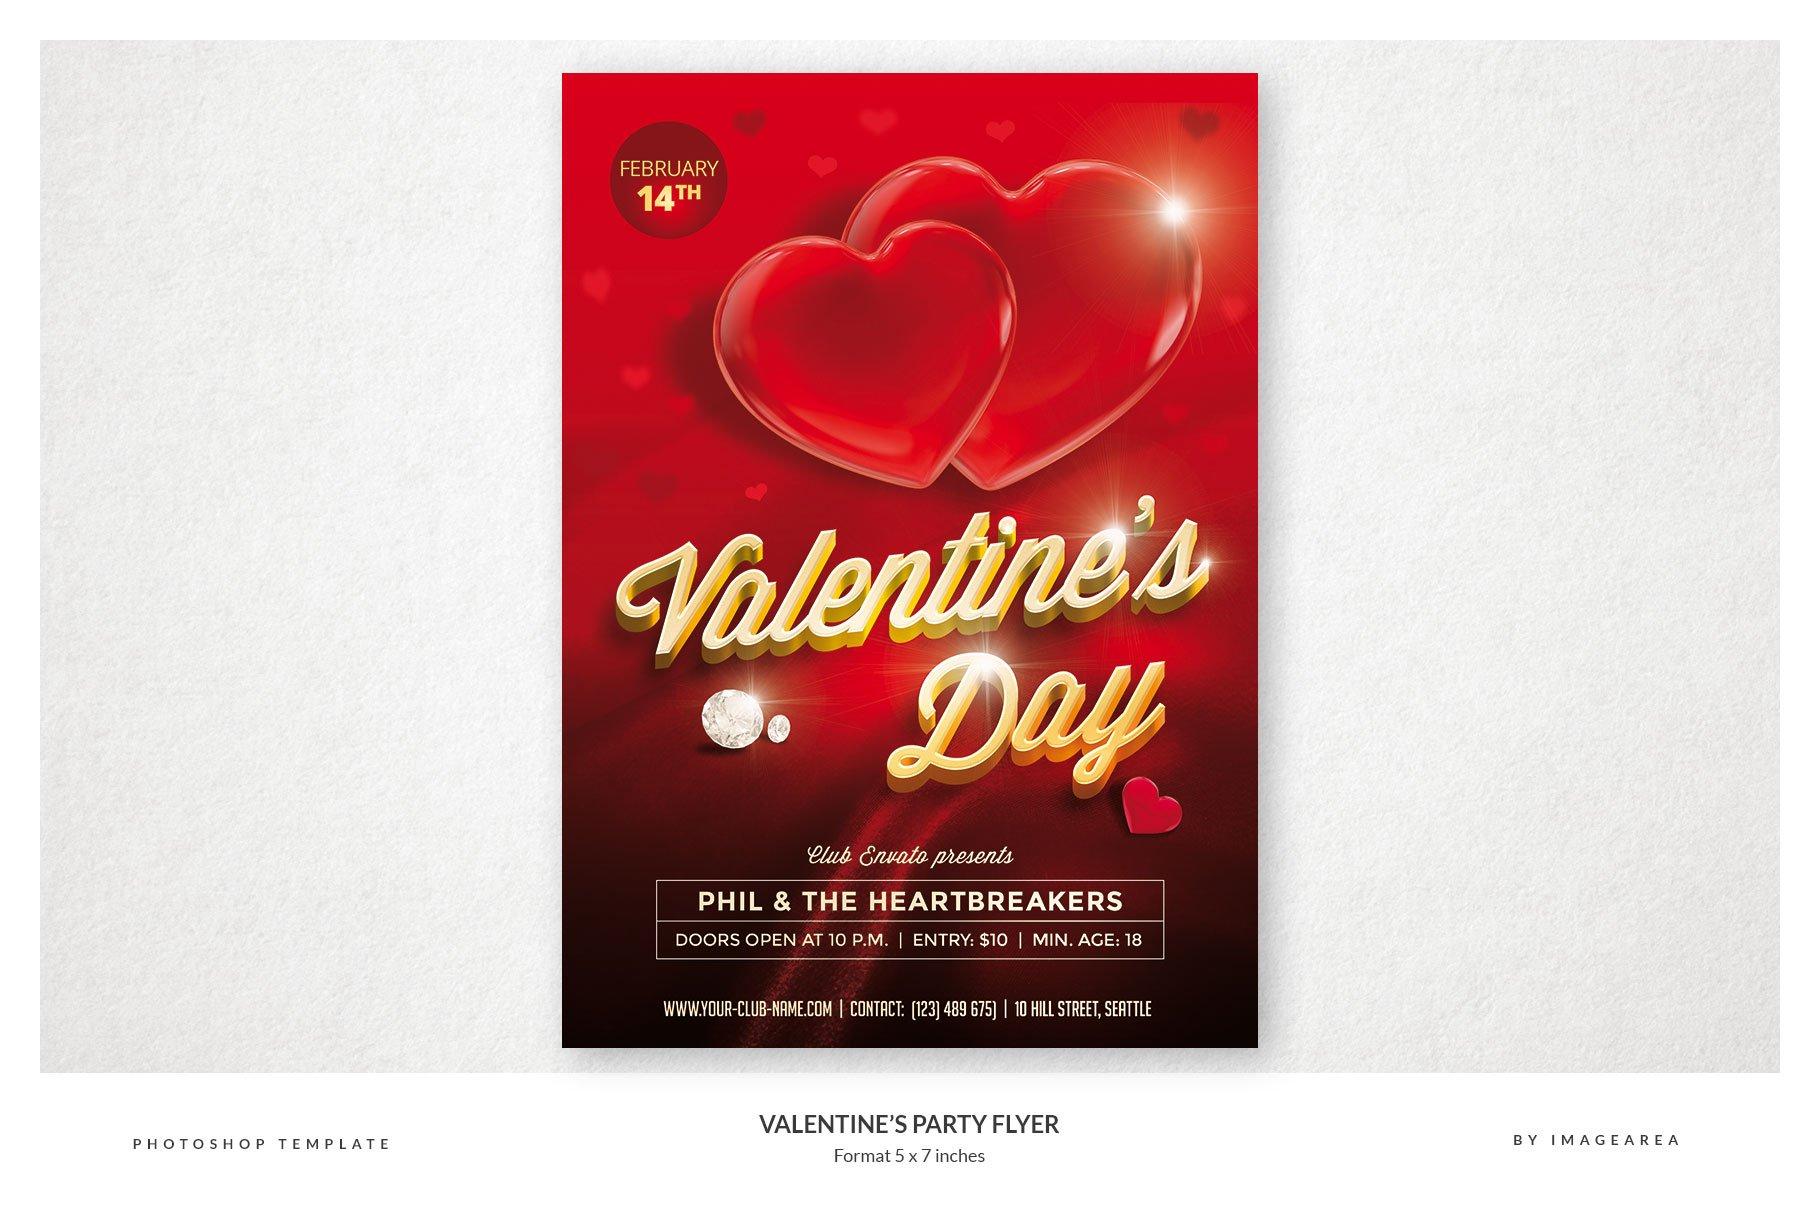 Valentines Party Flyer Templates Creative Market